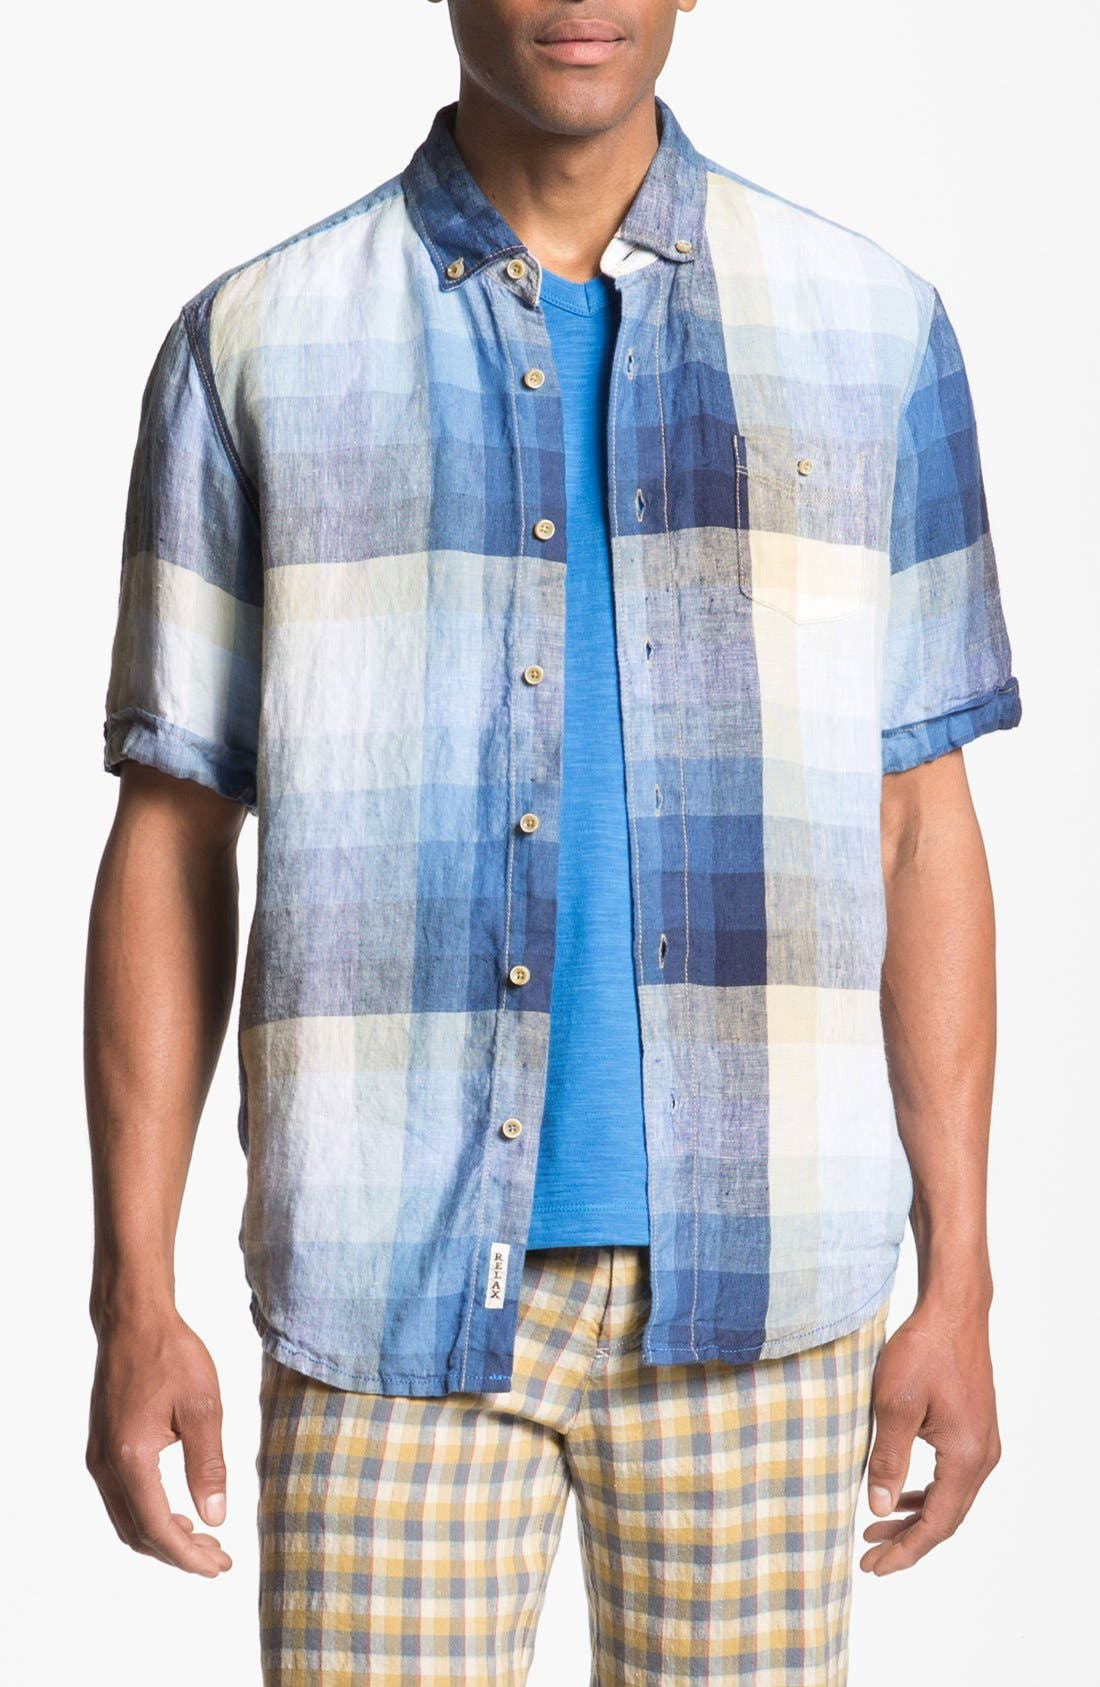 Main Image - Tommy Bahama 'Pacific Breezer' Short Sleeve Linen Sport Shirt